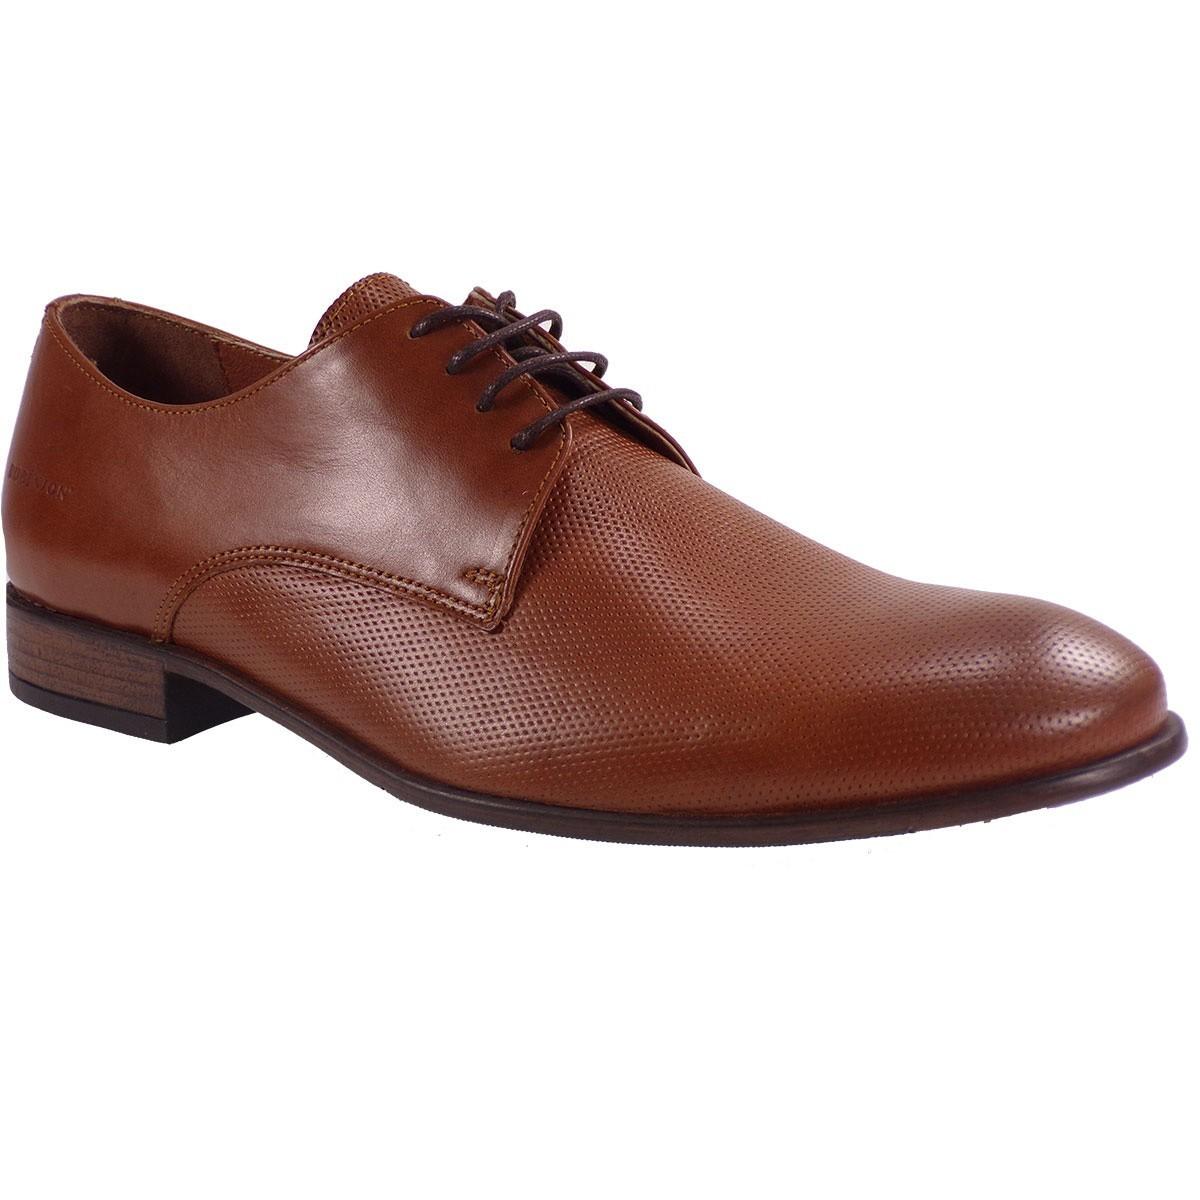 Robinson Ανδρικά Παπούτσια 2044 Ταμπά Δέρμα